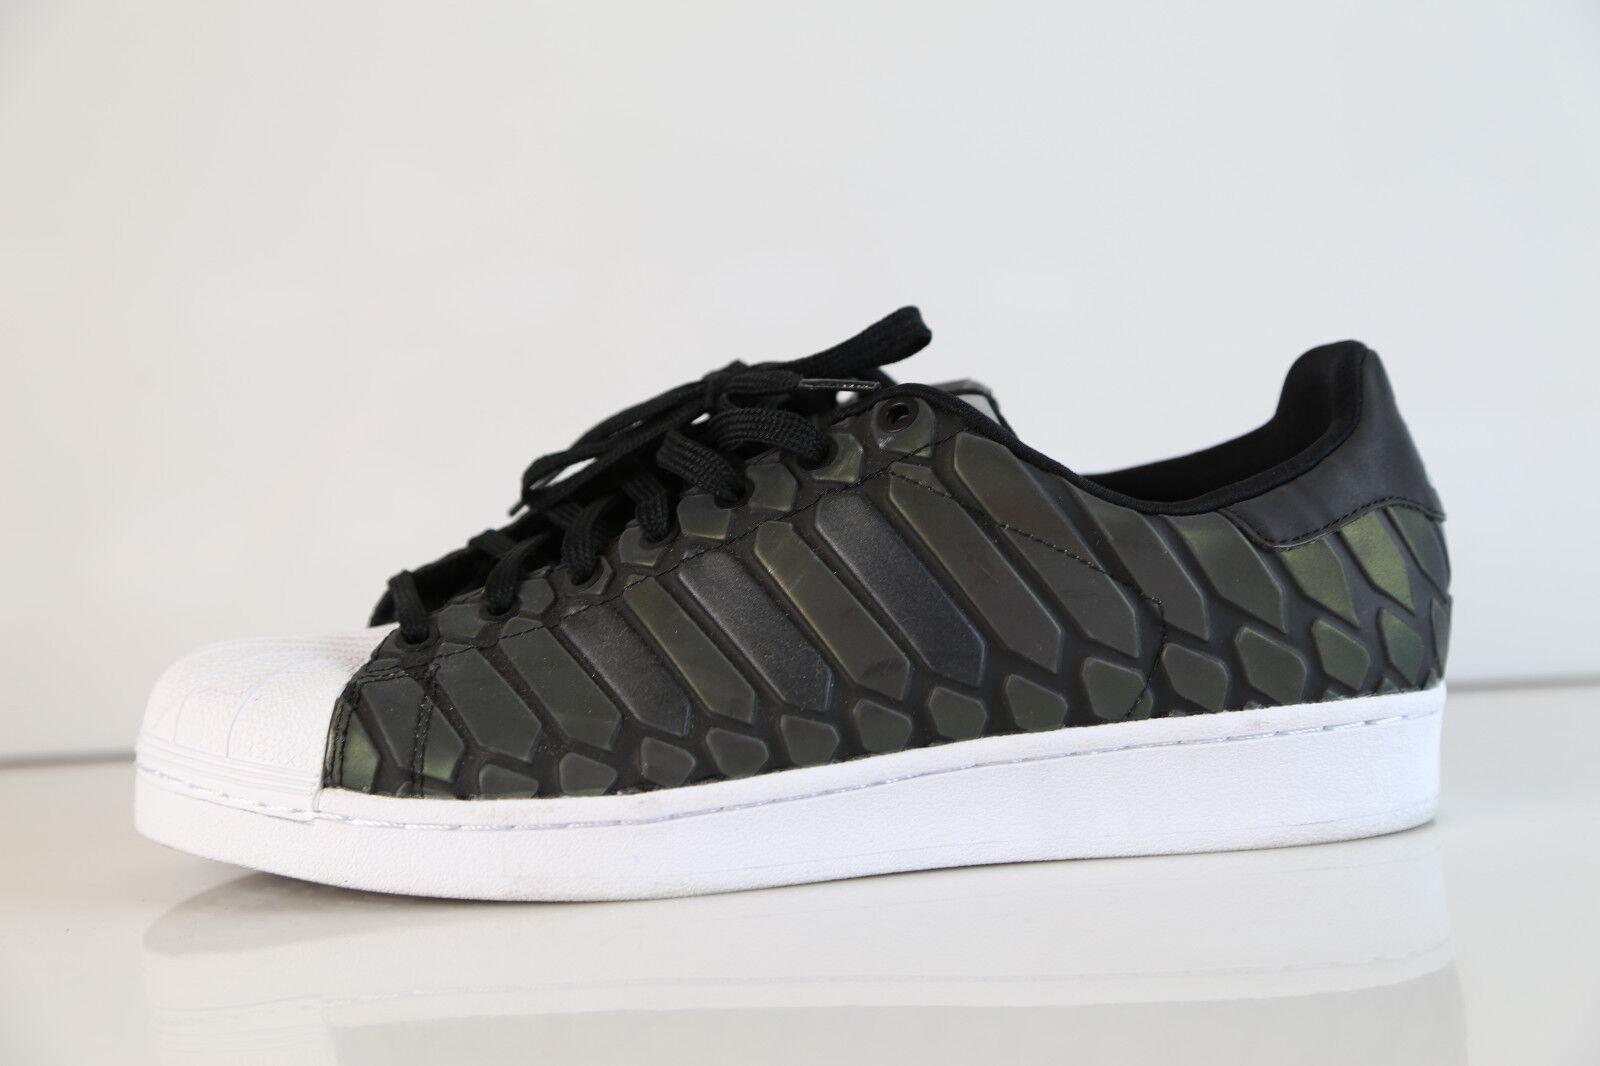 adidas 8K Trainers homme noir/ Gris /blanc athlétique Sneakers chaussures